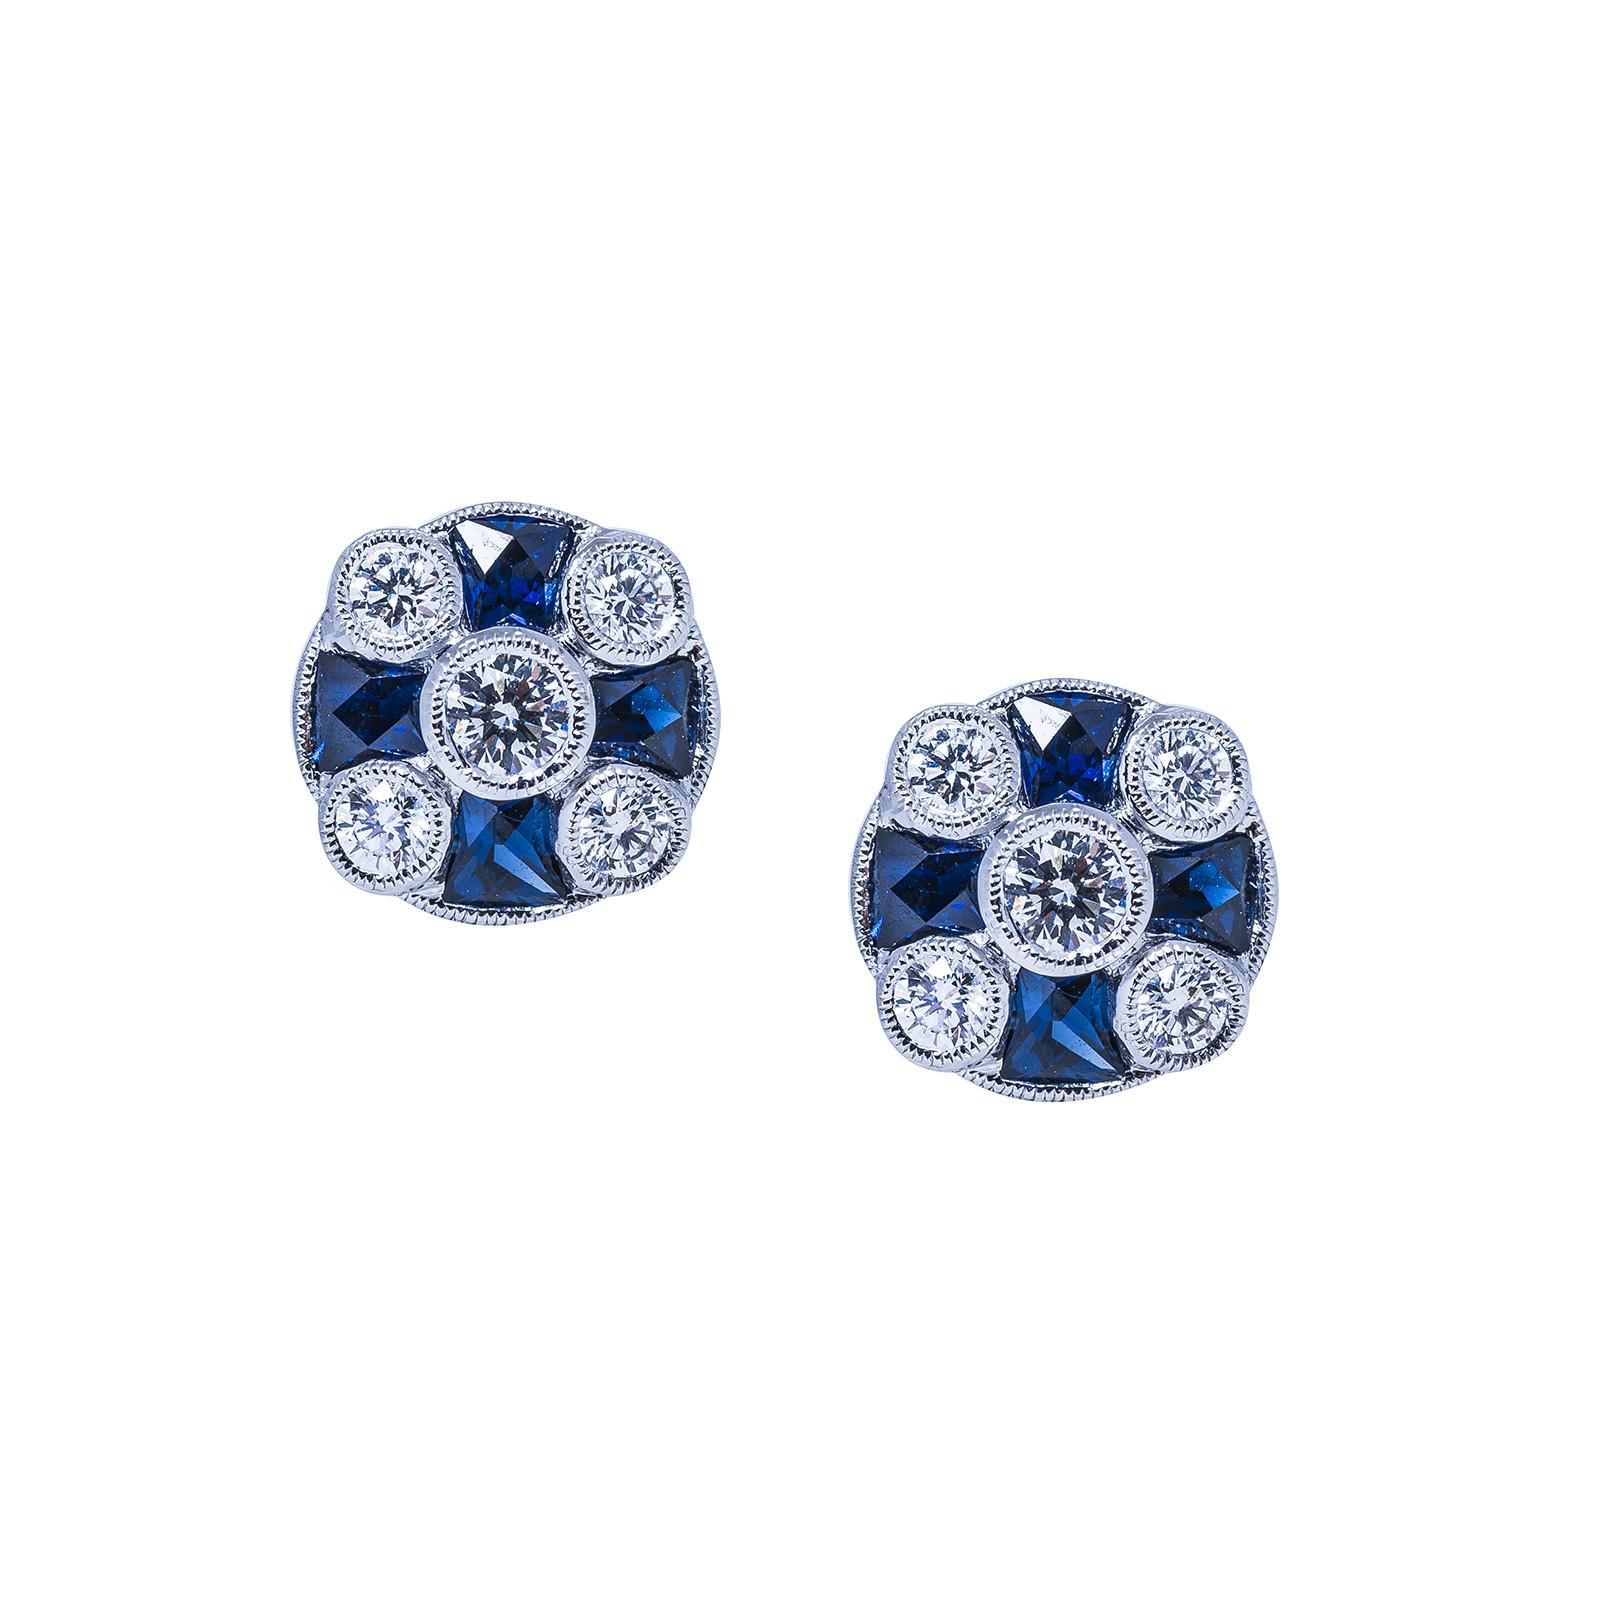 New Beverley K 1.33 CTW Blue Sapphire and Diamond Earrings